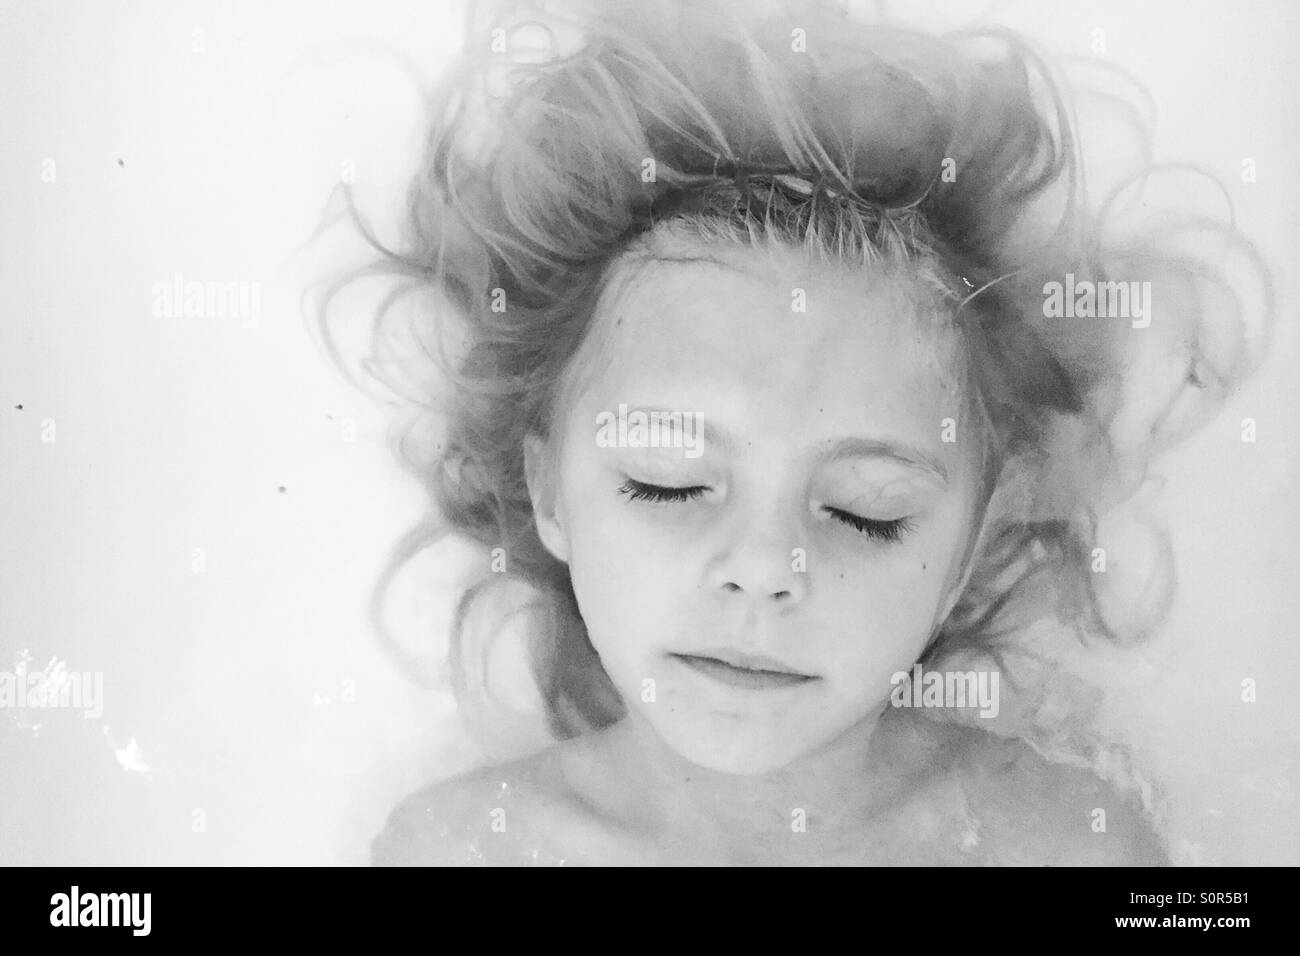 Girl in a bath - Stock Image